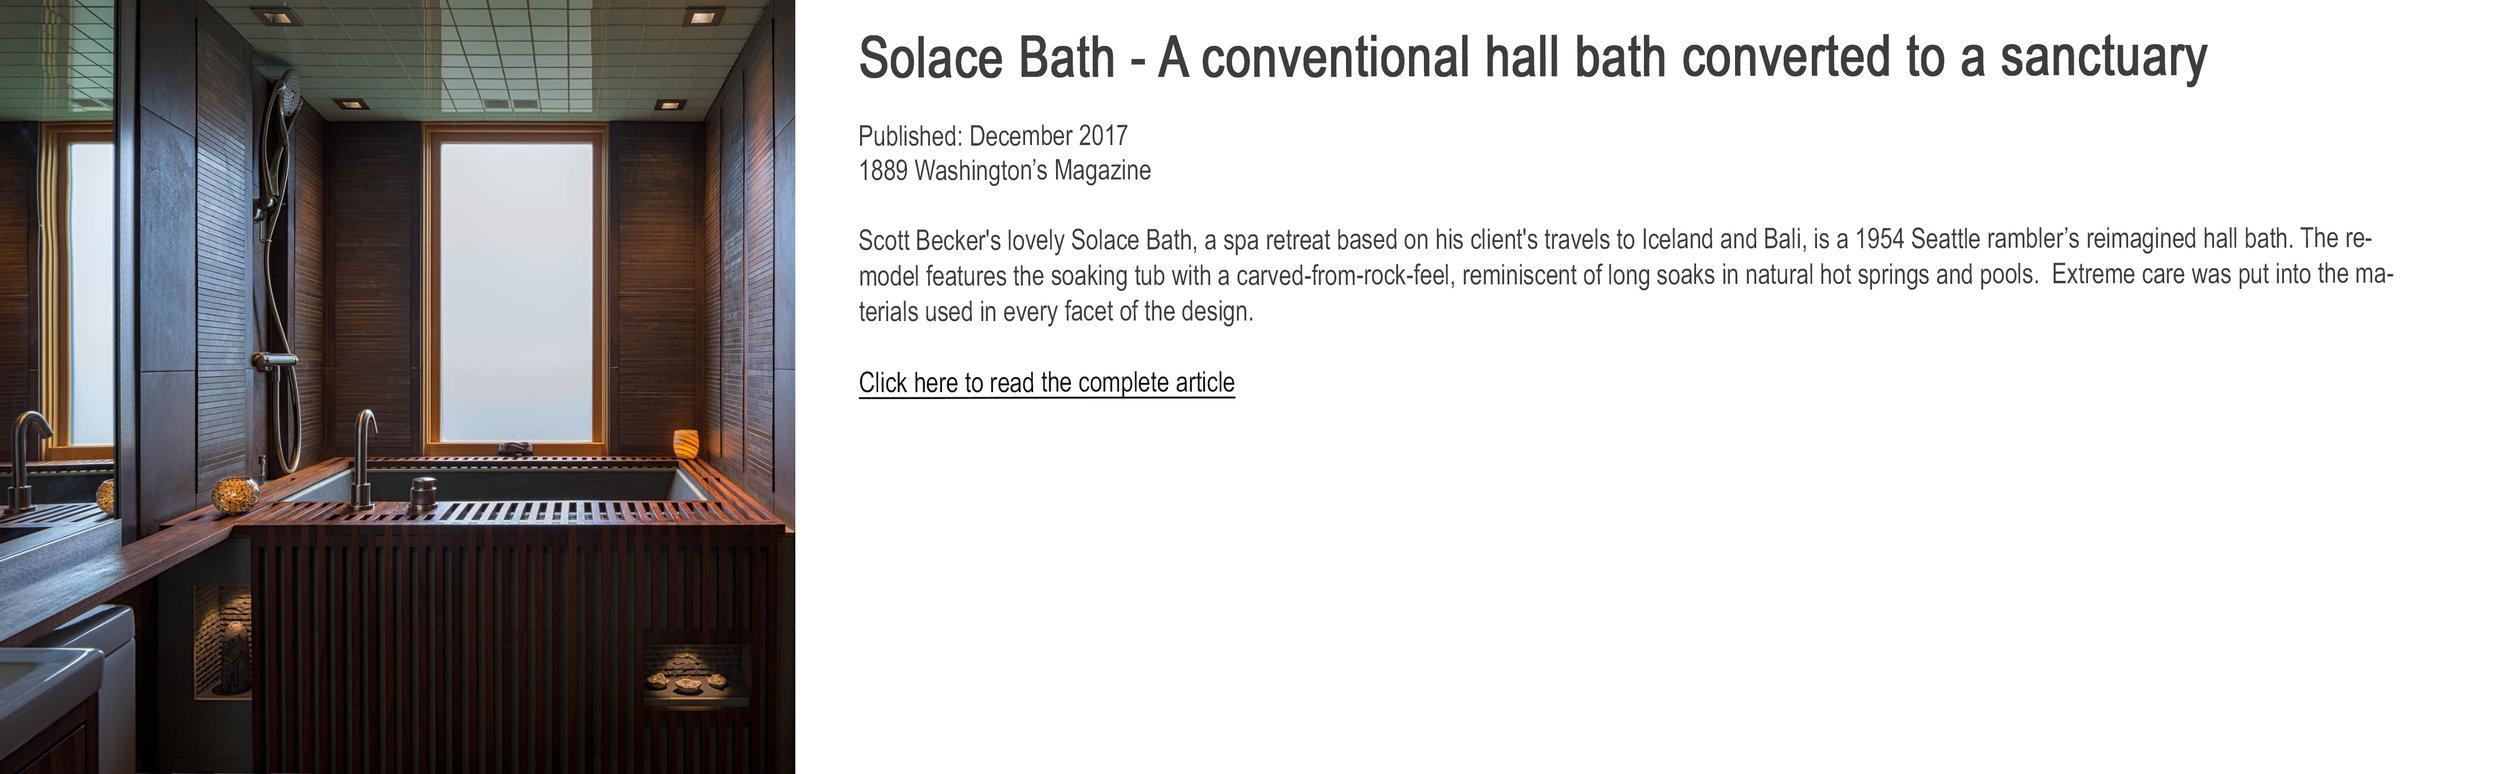 Solace Bath.jpg